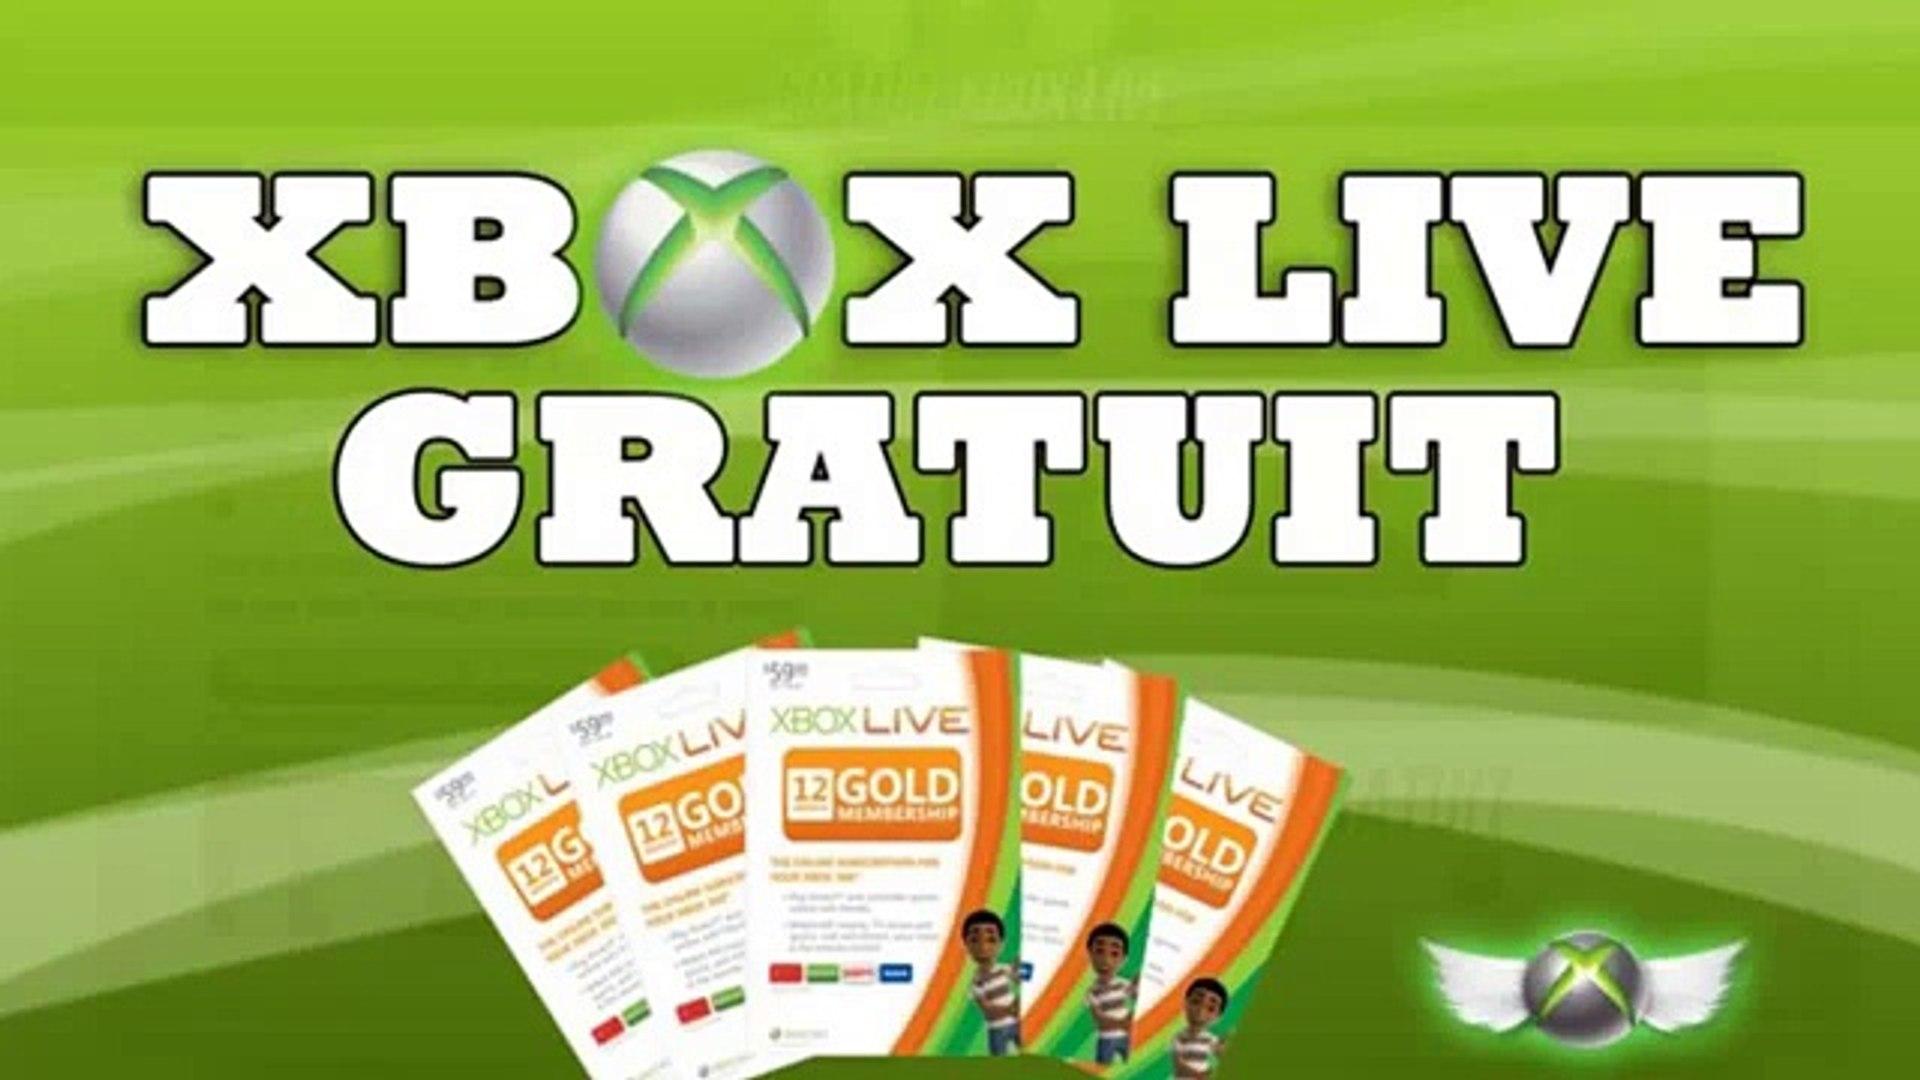 XBOX LIVE GENERATOR - HACK FREE GENERATOR XBOX -  2015 JANVIER